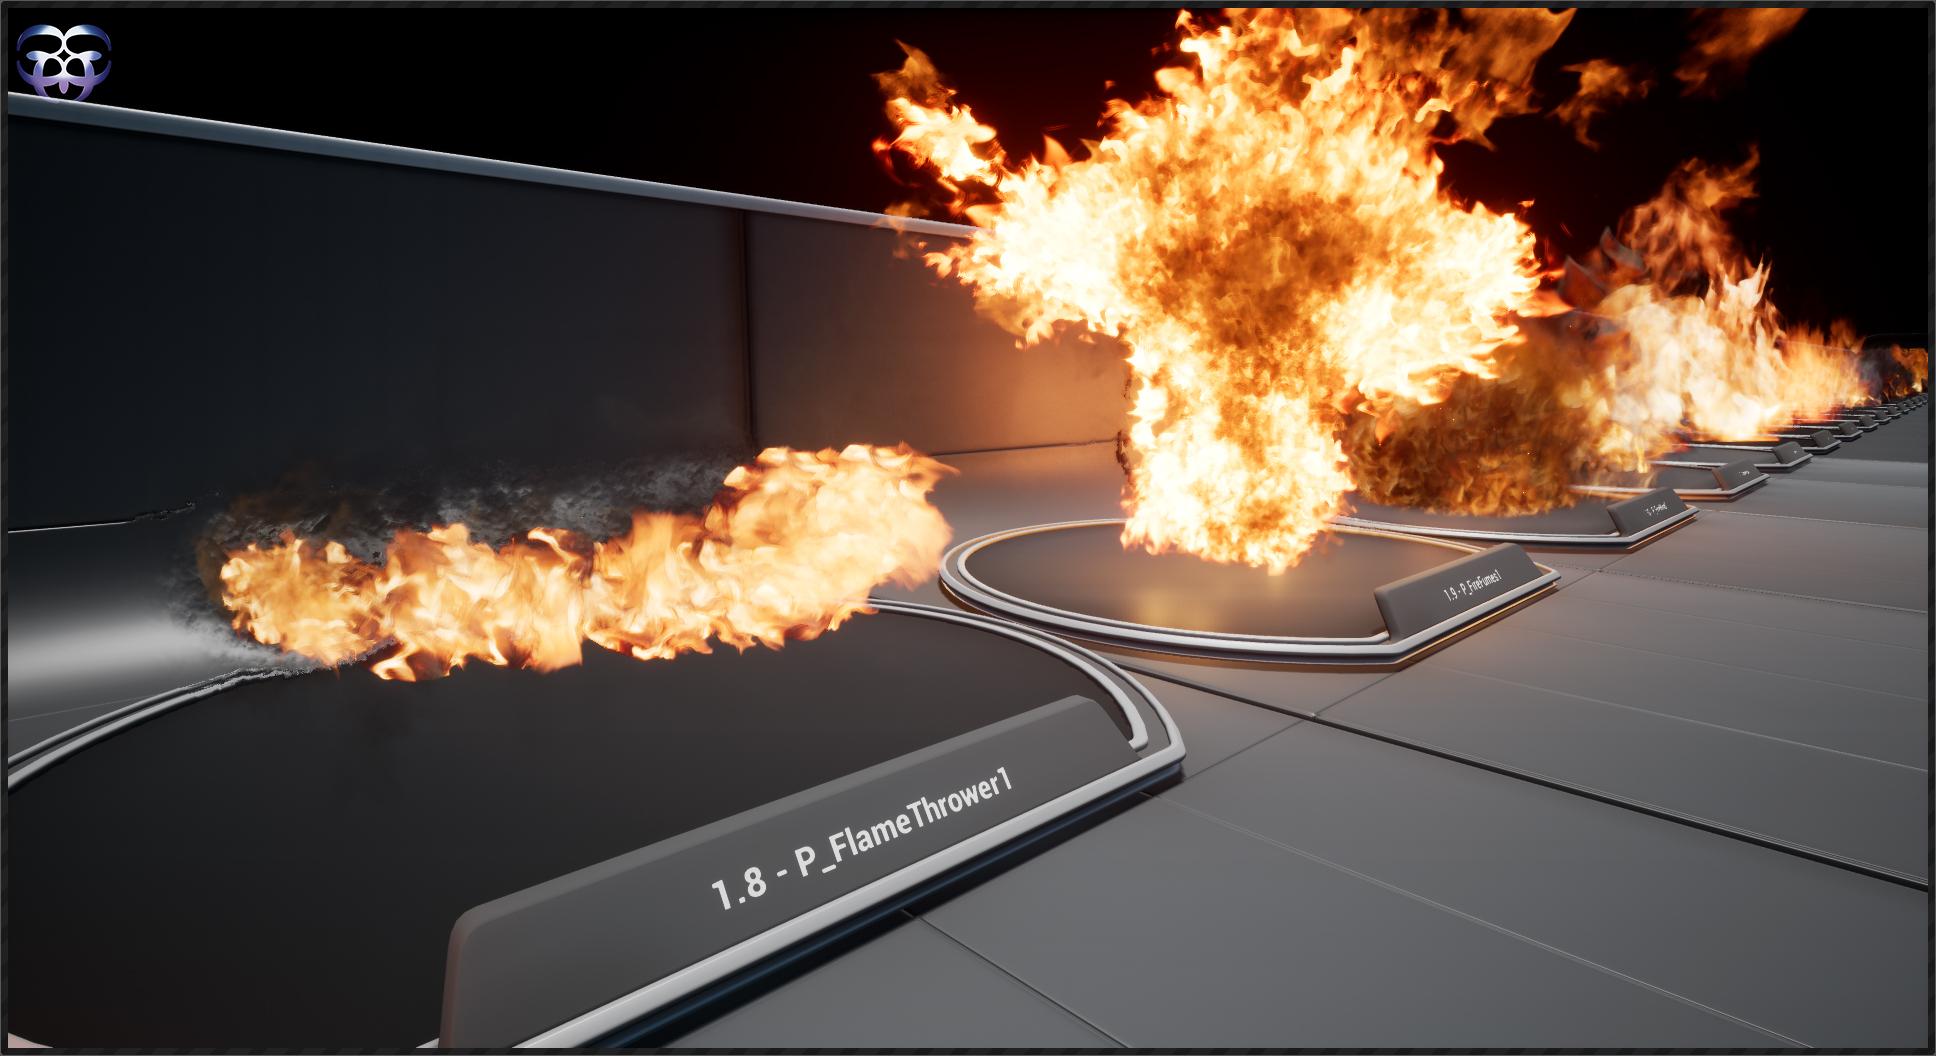 FireBuilder_ScreenShot_02.jpg